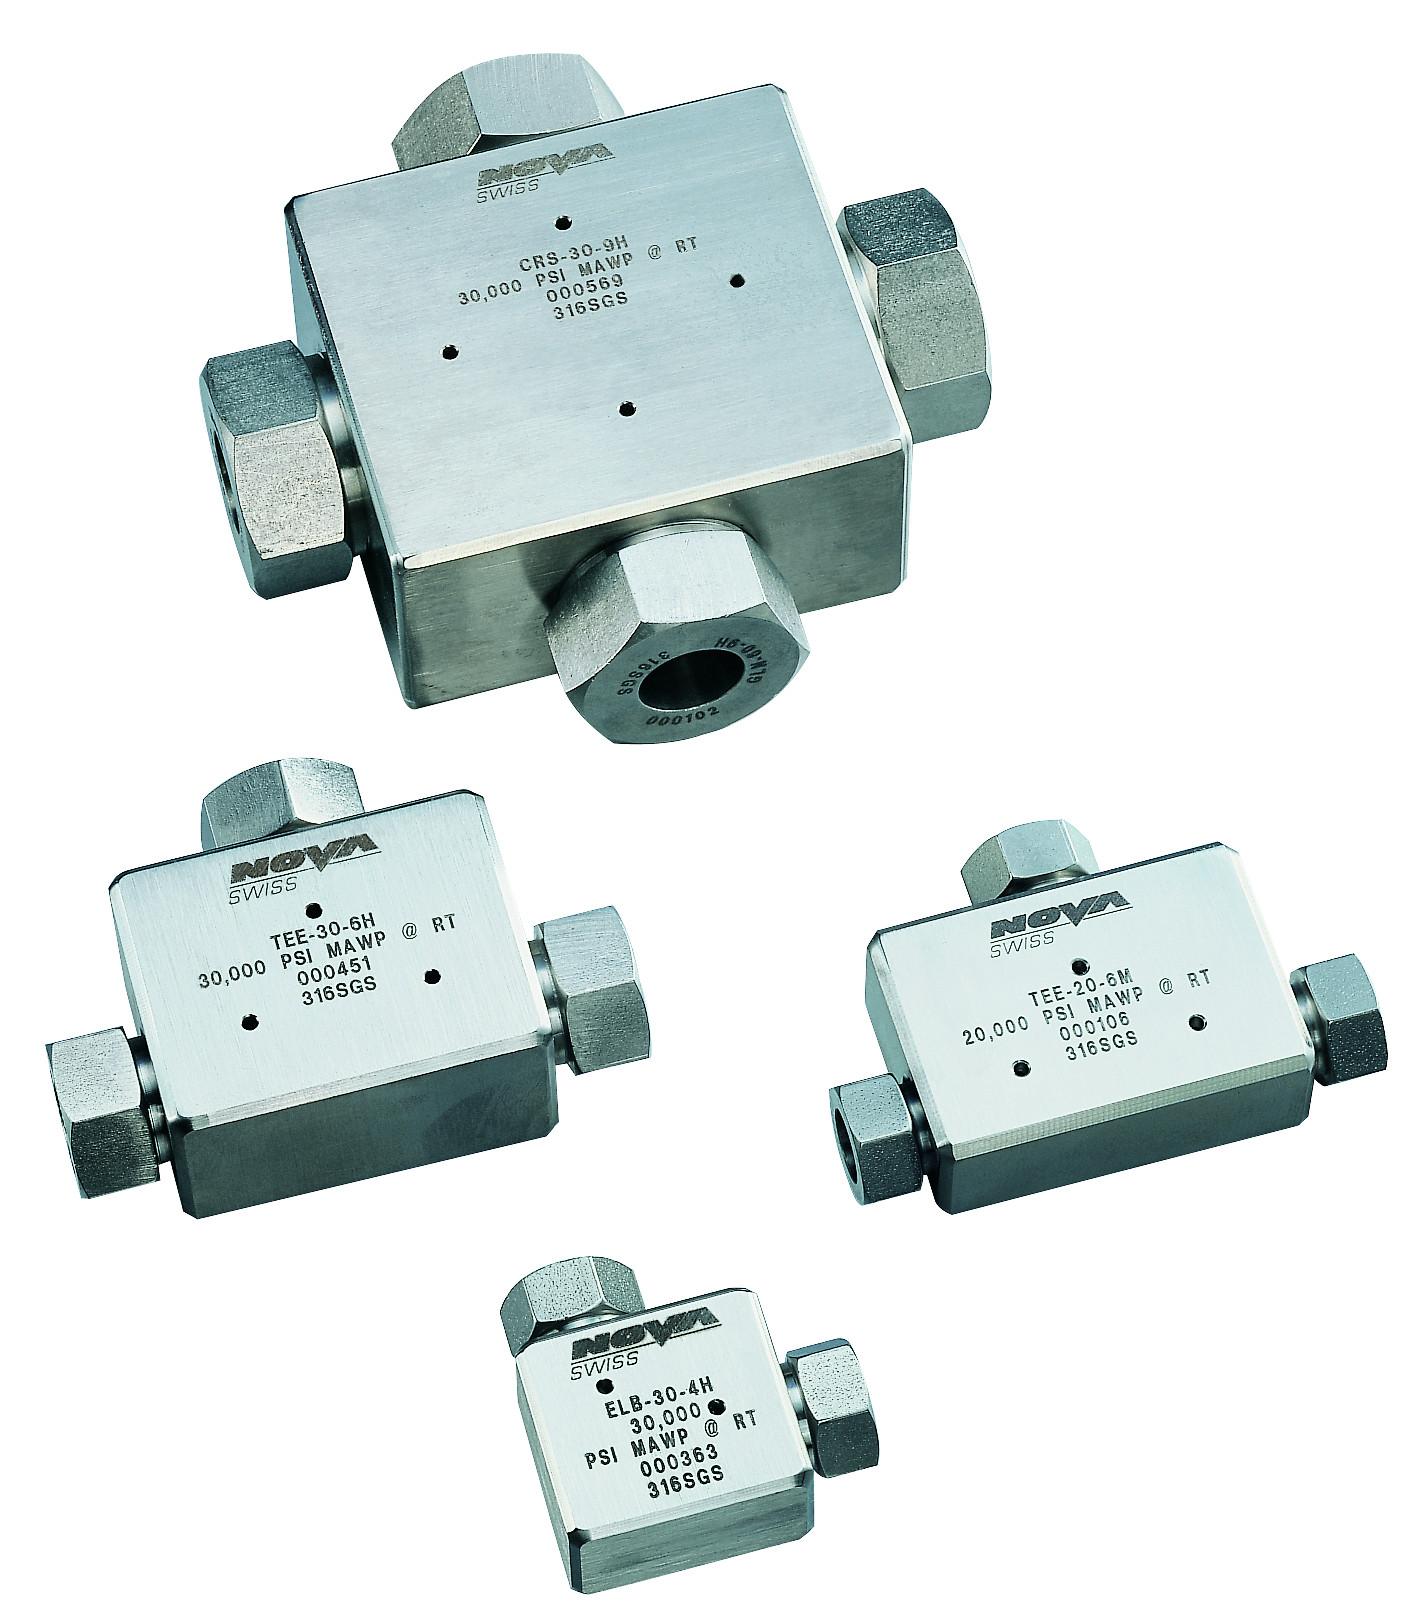 Fitting High pressure Nåleventiler needle valve høytrykk high pressure DBB Block Bleed kobling Nova Swiss instrument ventil systems adapter connector